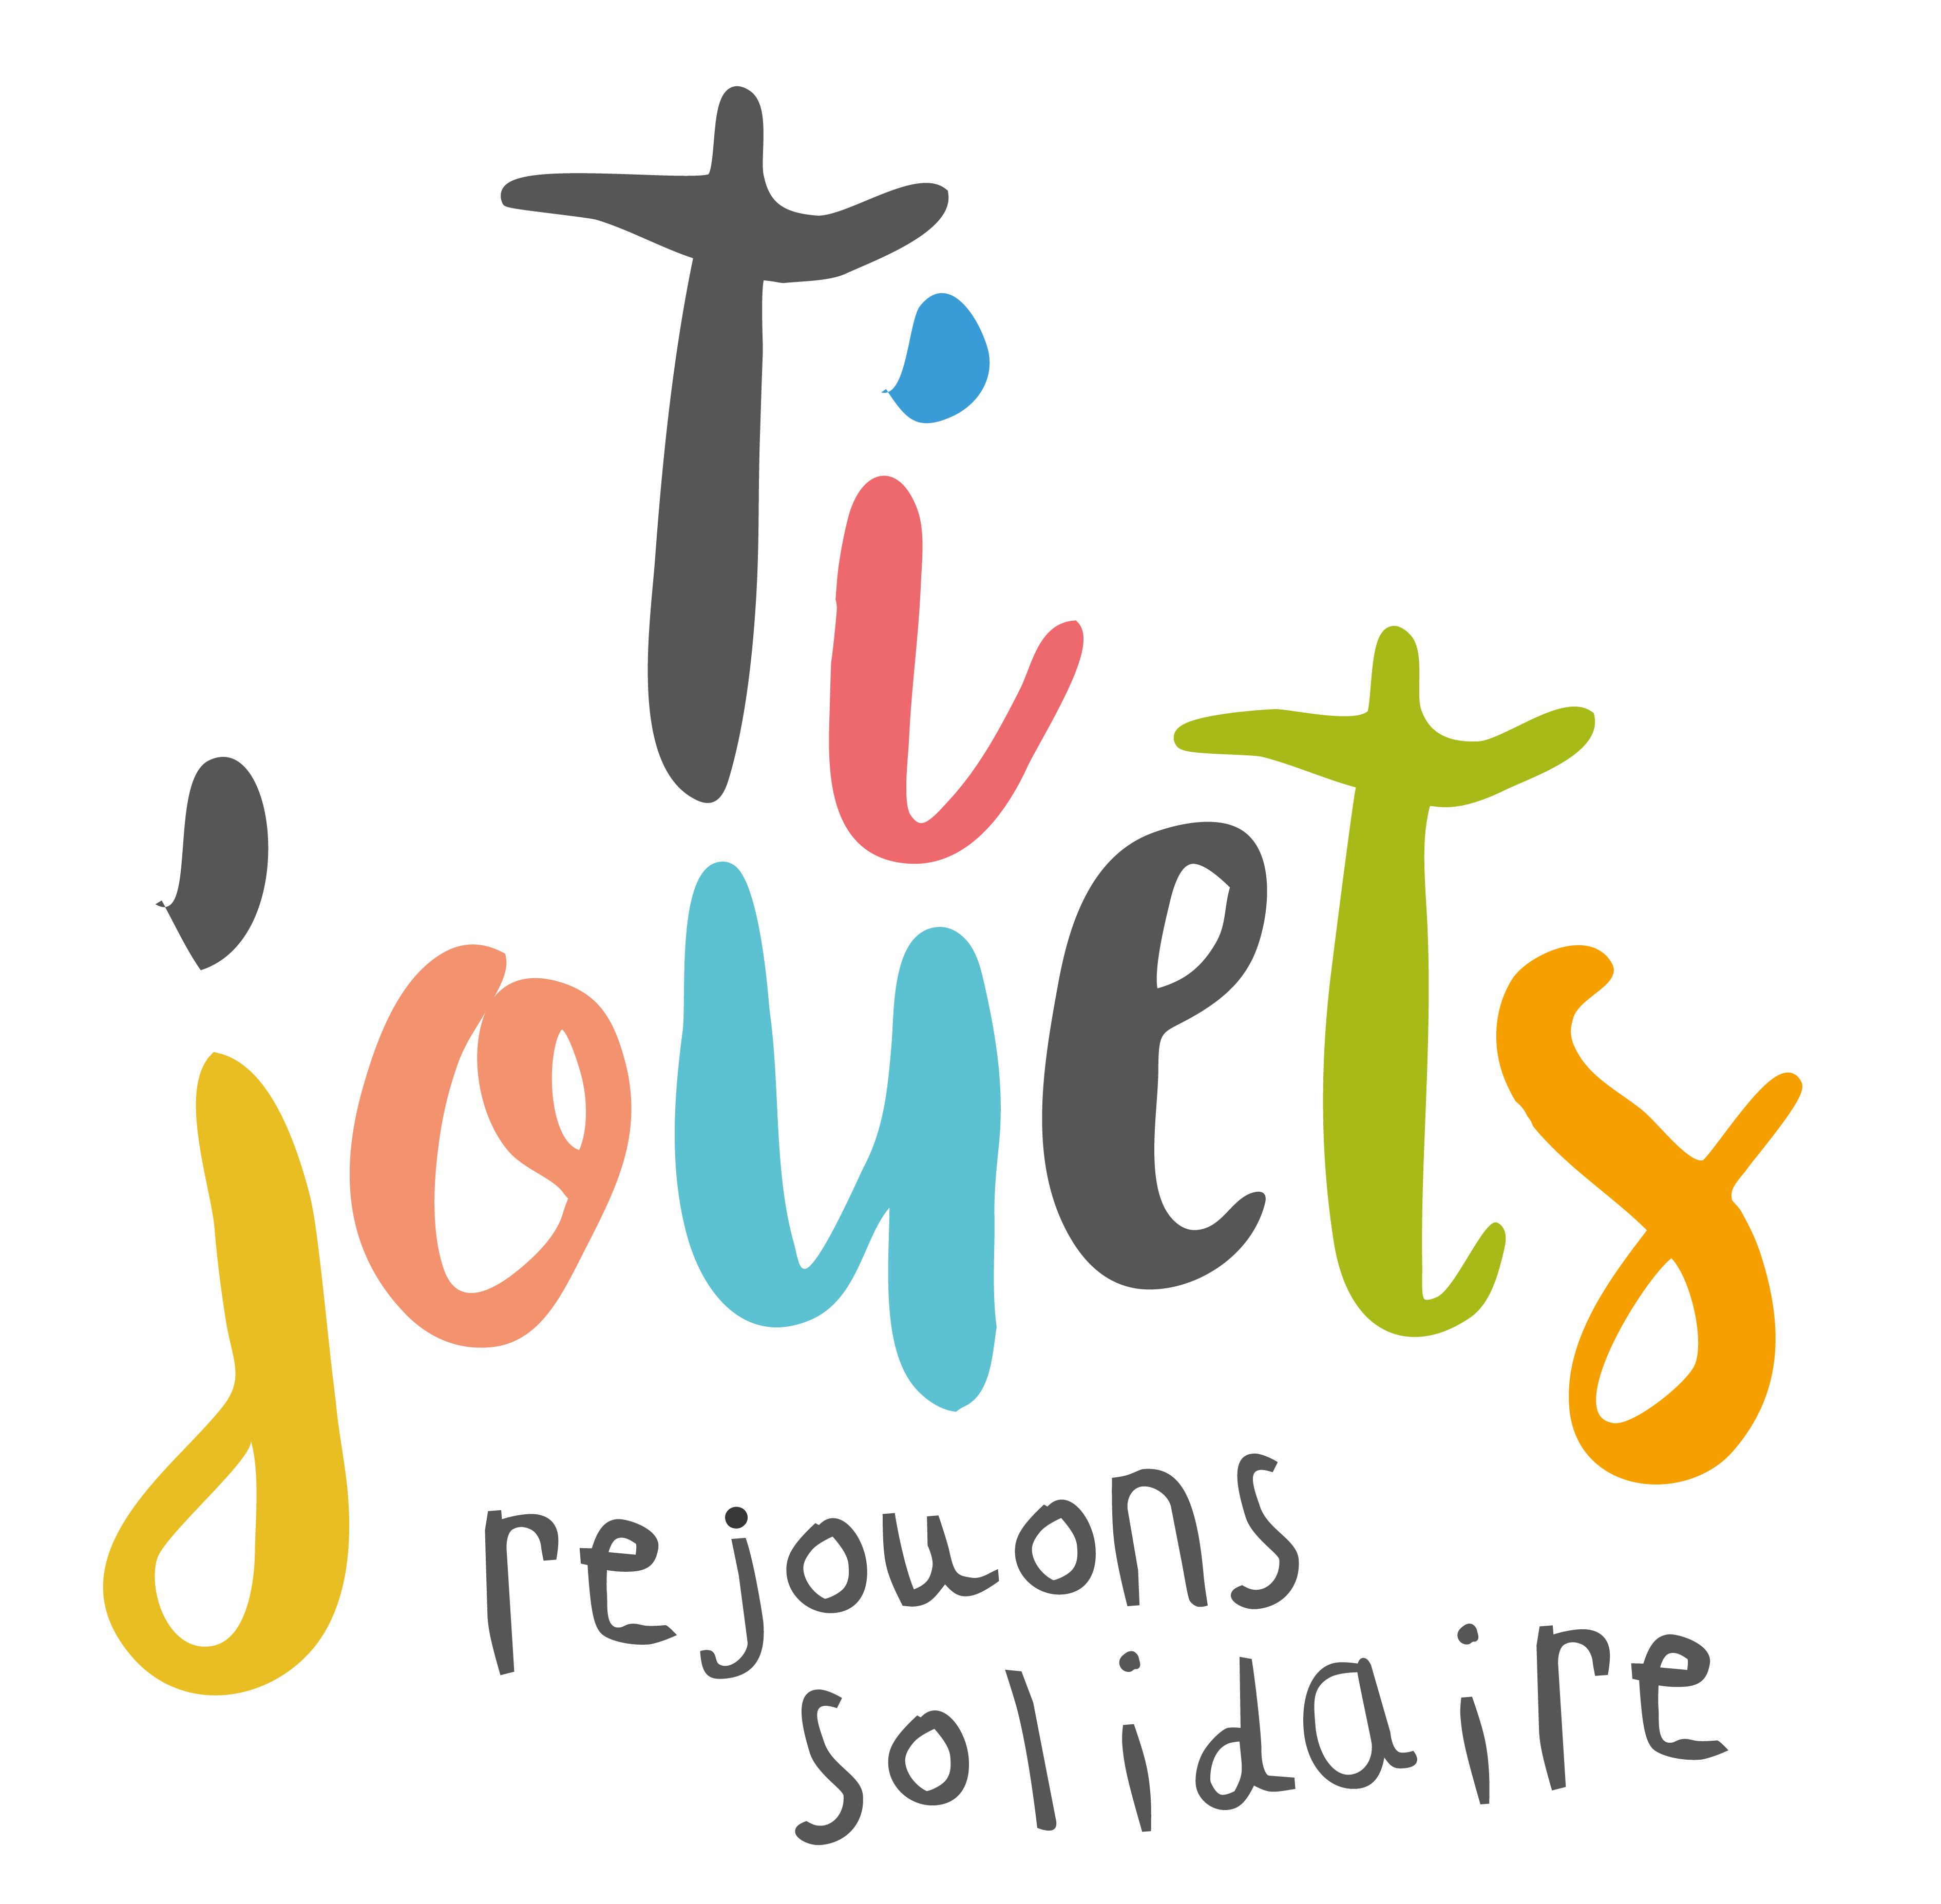 Ti Jouets